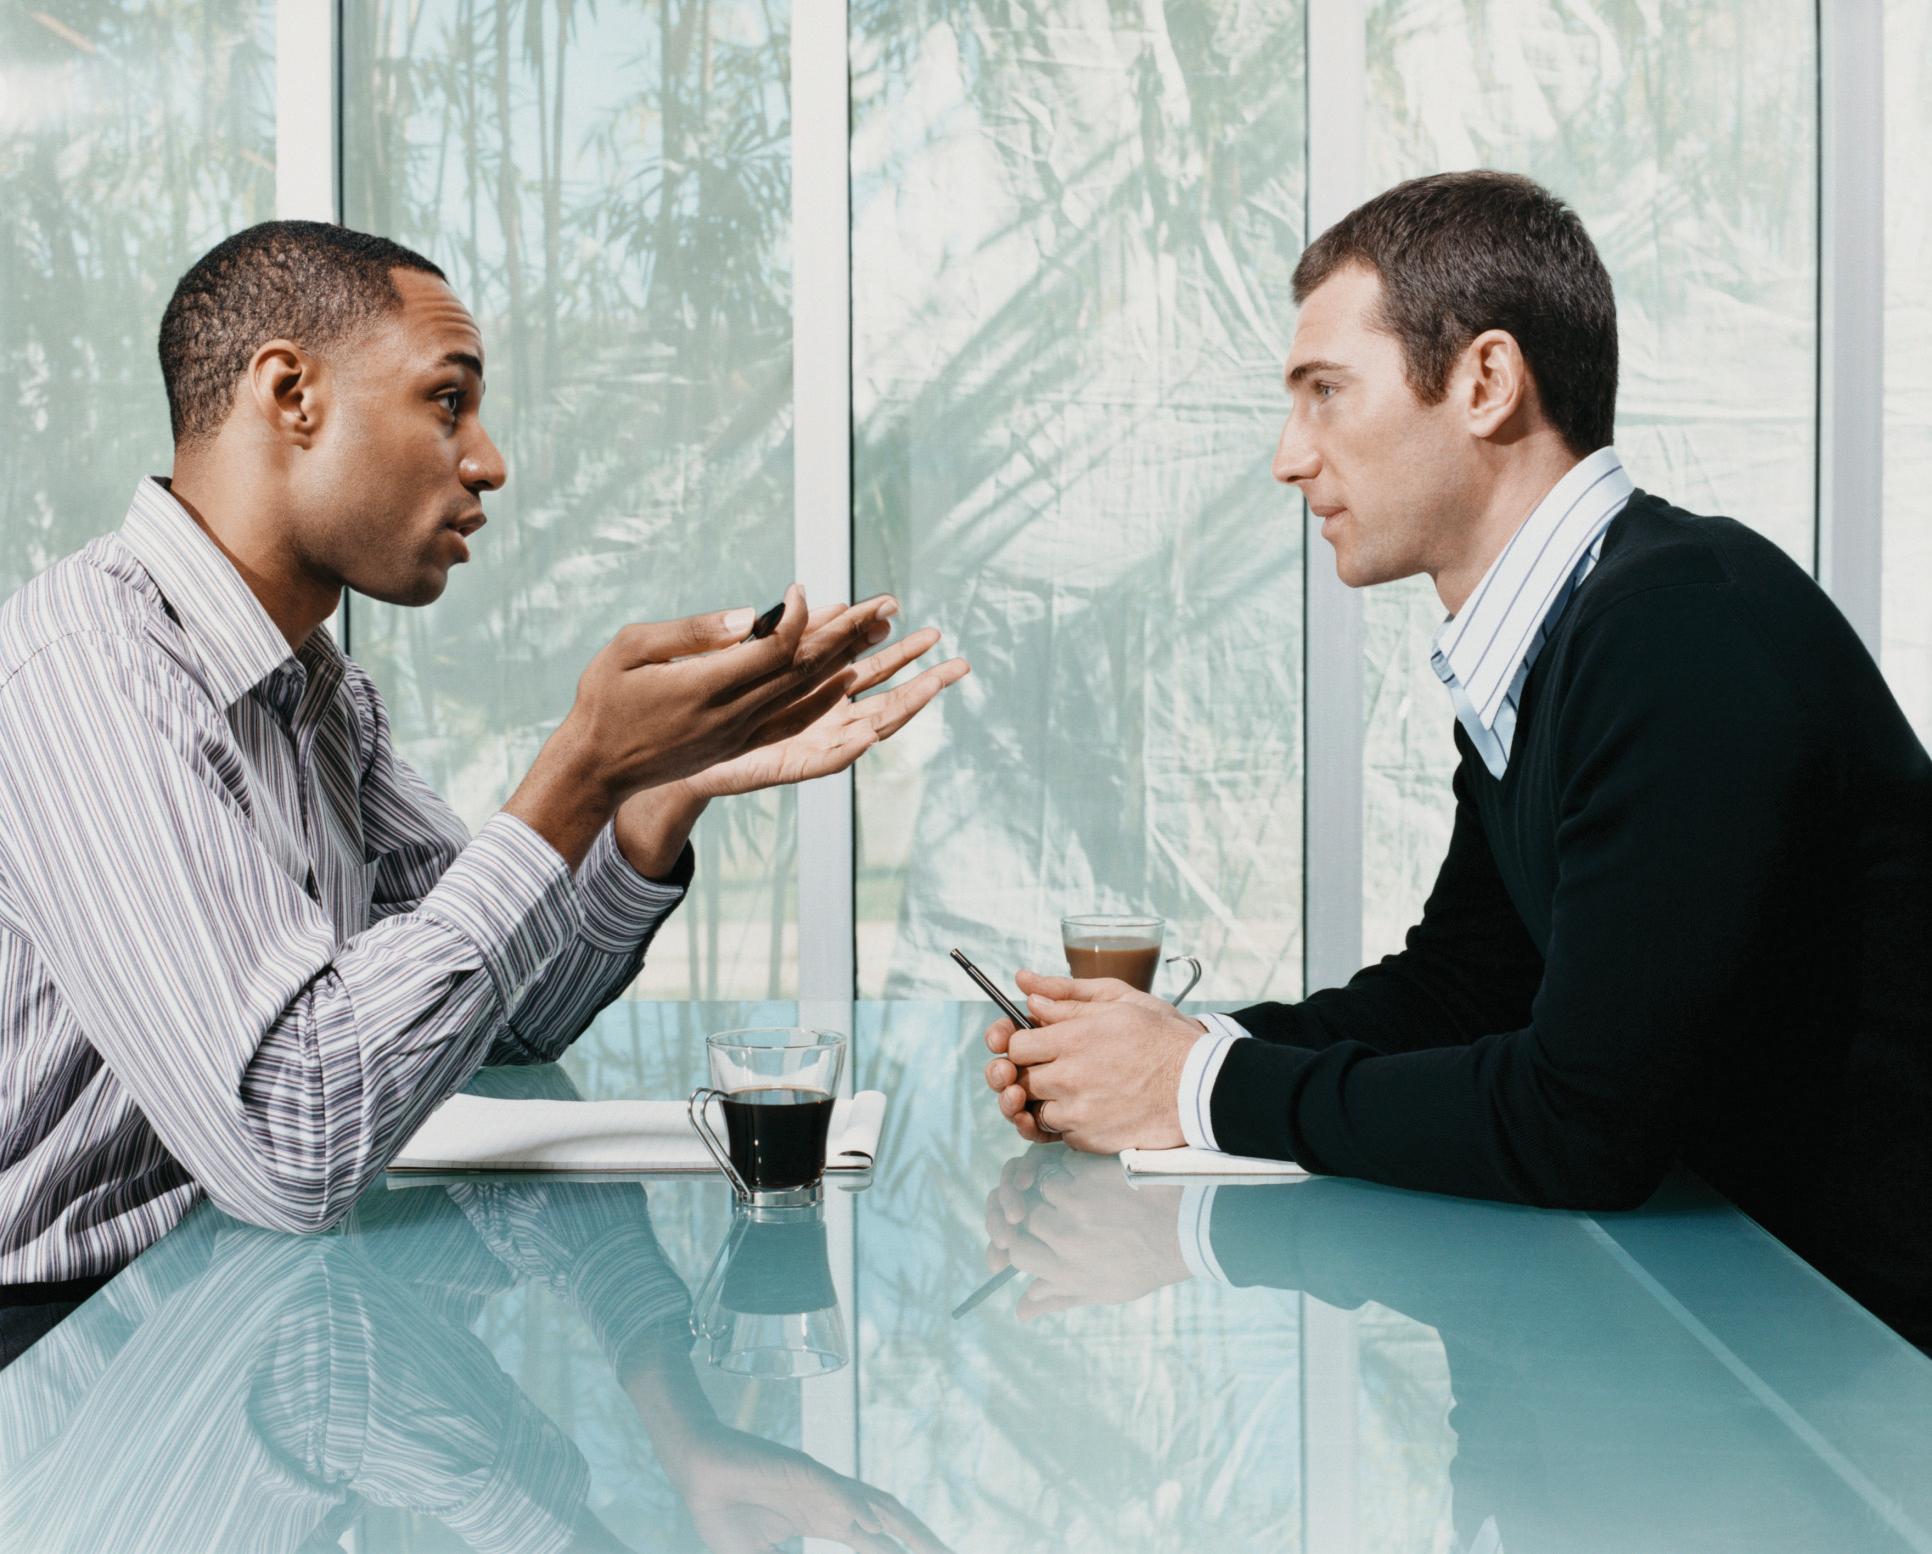 nonverbal communicationnonverbal communication is more involuntary than verbal